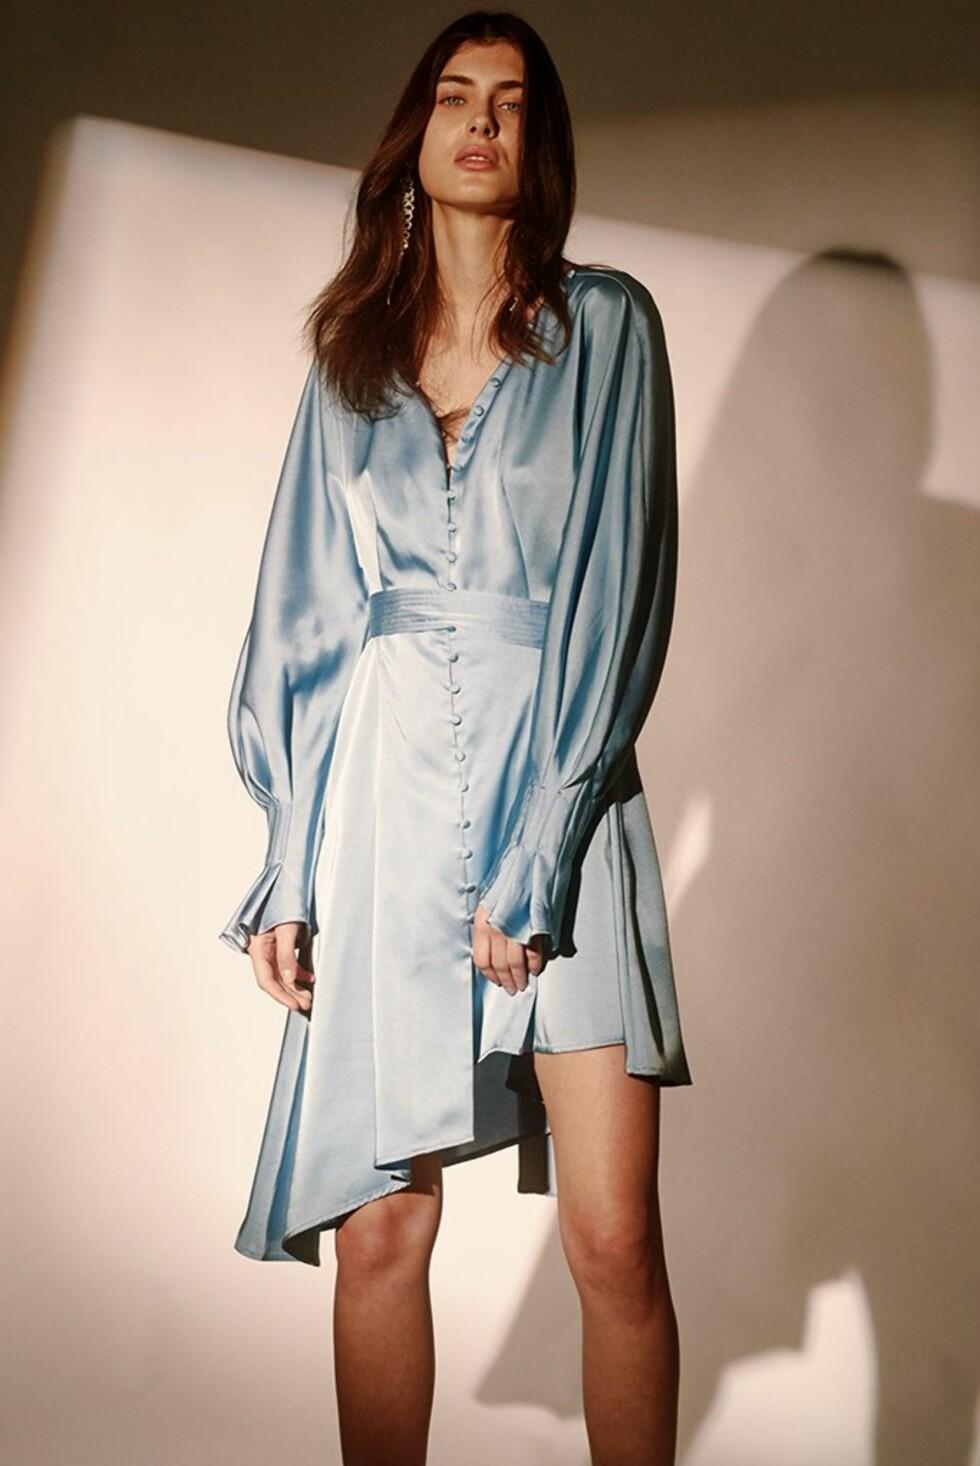 Kjole fra Style Mafia |1020,-| https://stylemafia.us/collections/new-arrivals/products/jacobina-dress-asymmetrical-pleated-dress#.WzNodVUzbRZ